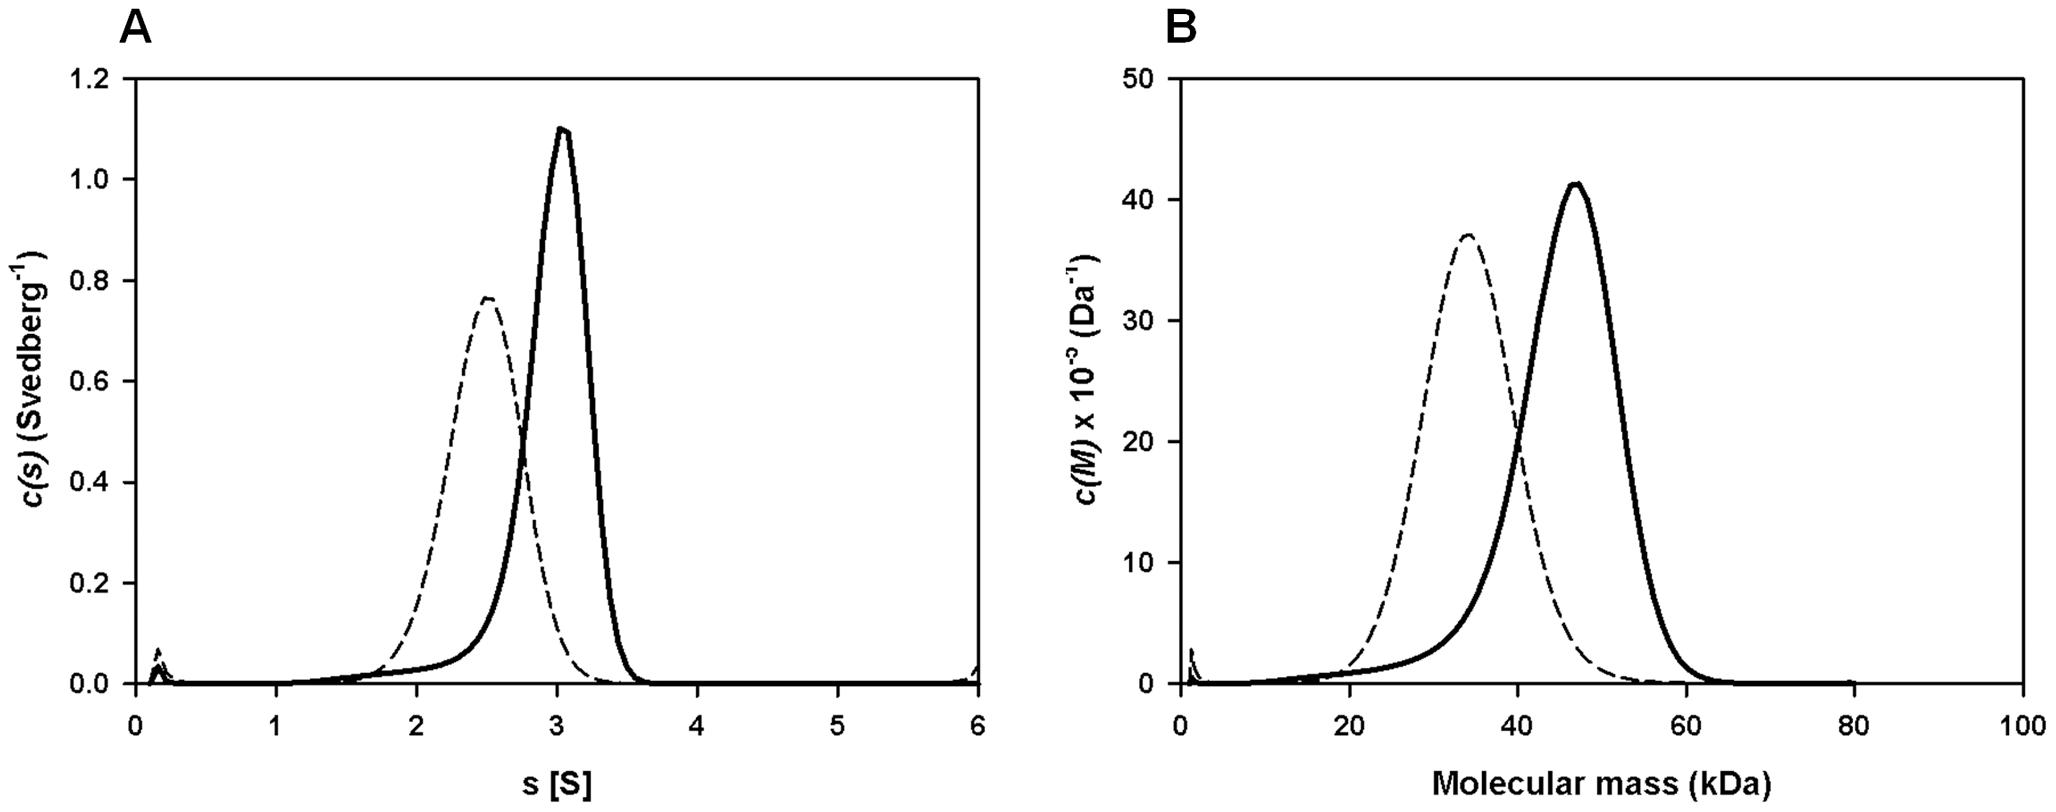 Sedimentation velocity analysis of recombinant FhHDM-1.